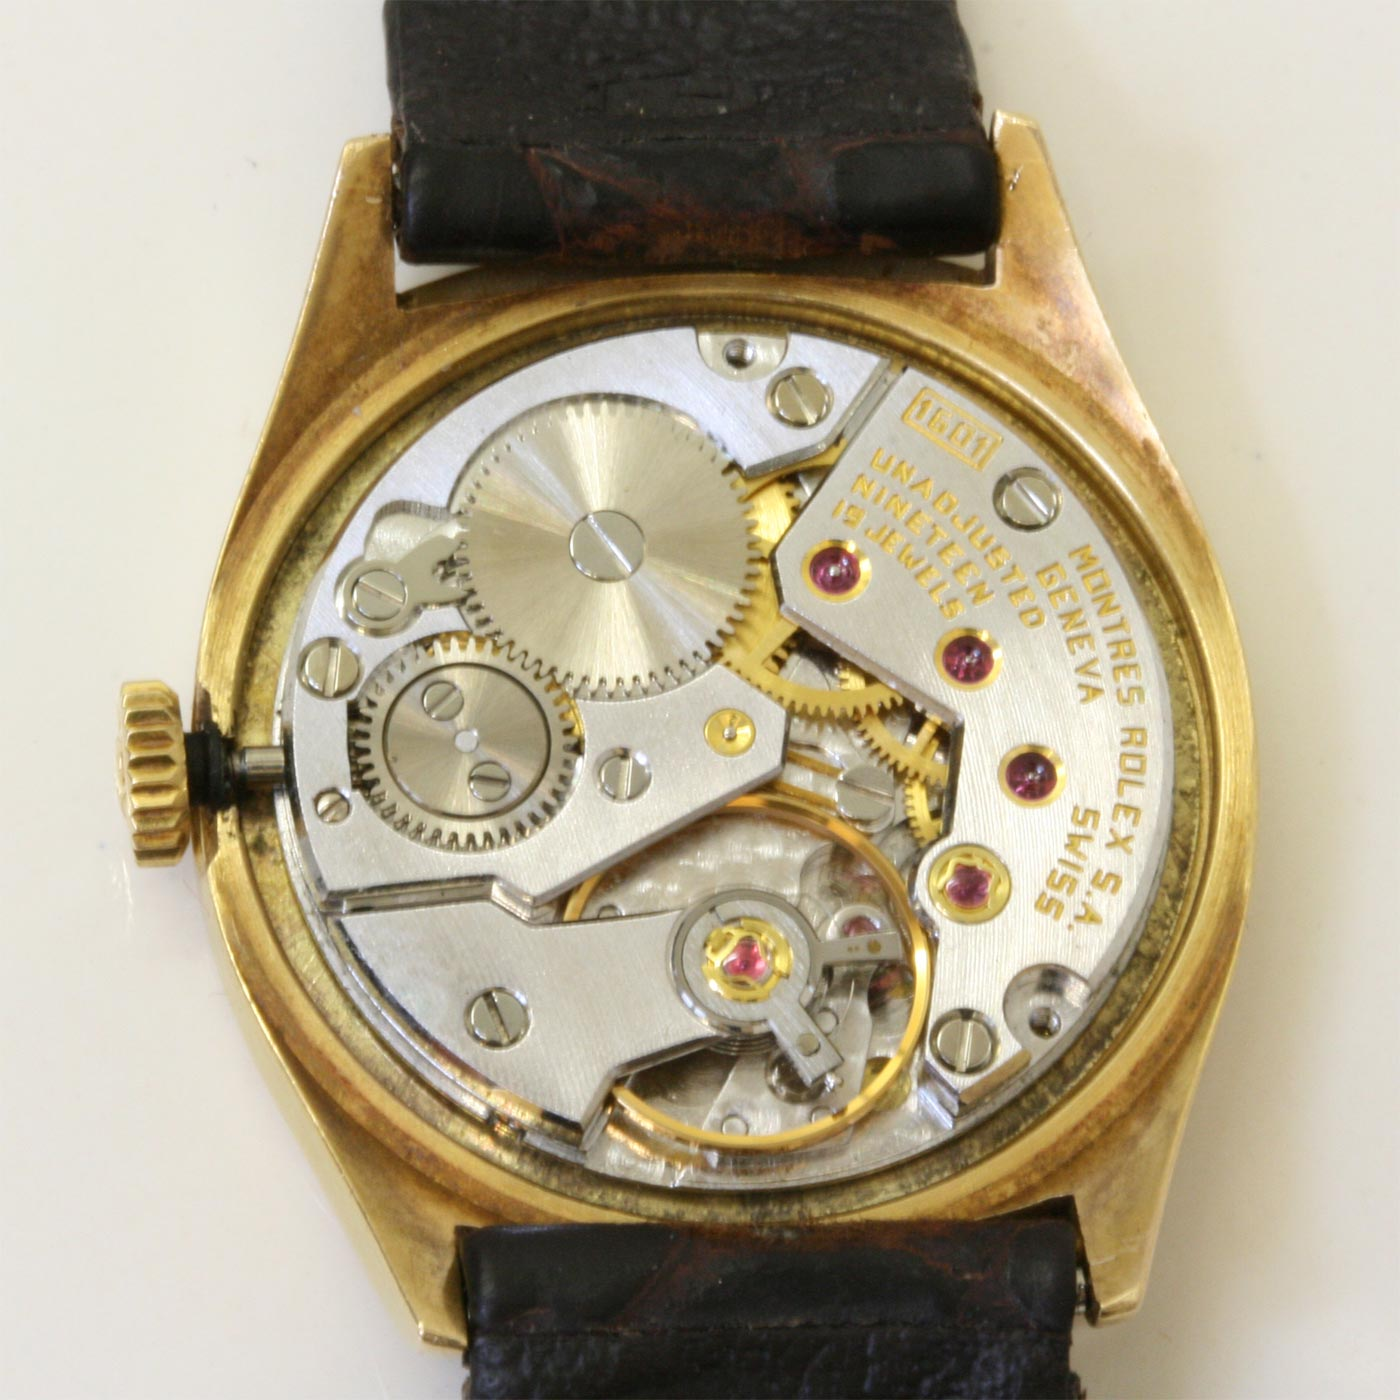 buy 18ct rolex cellini ladys wrist watch sold items